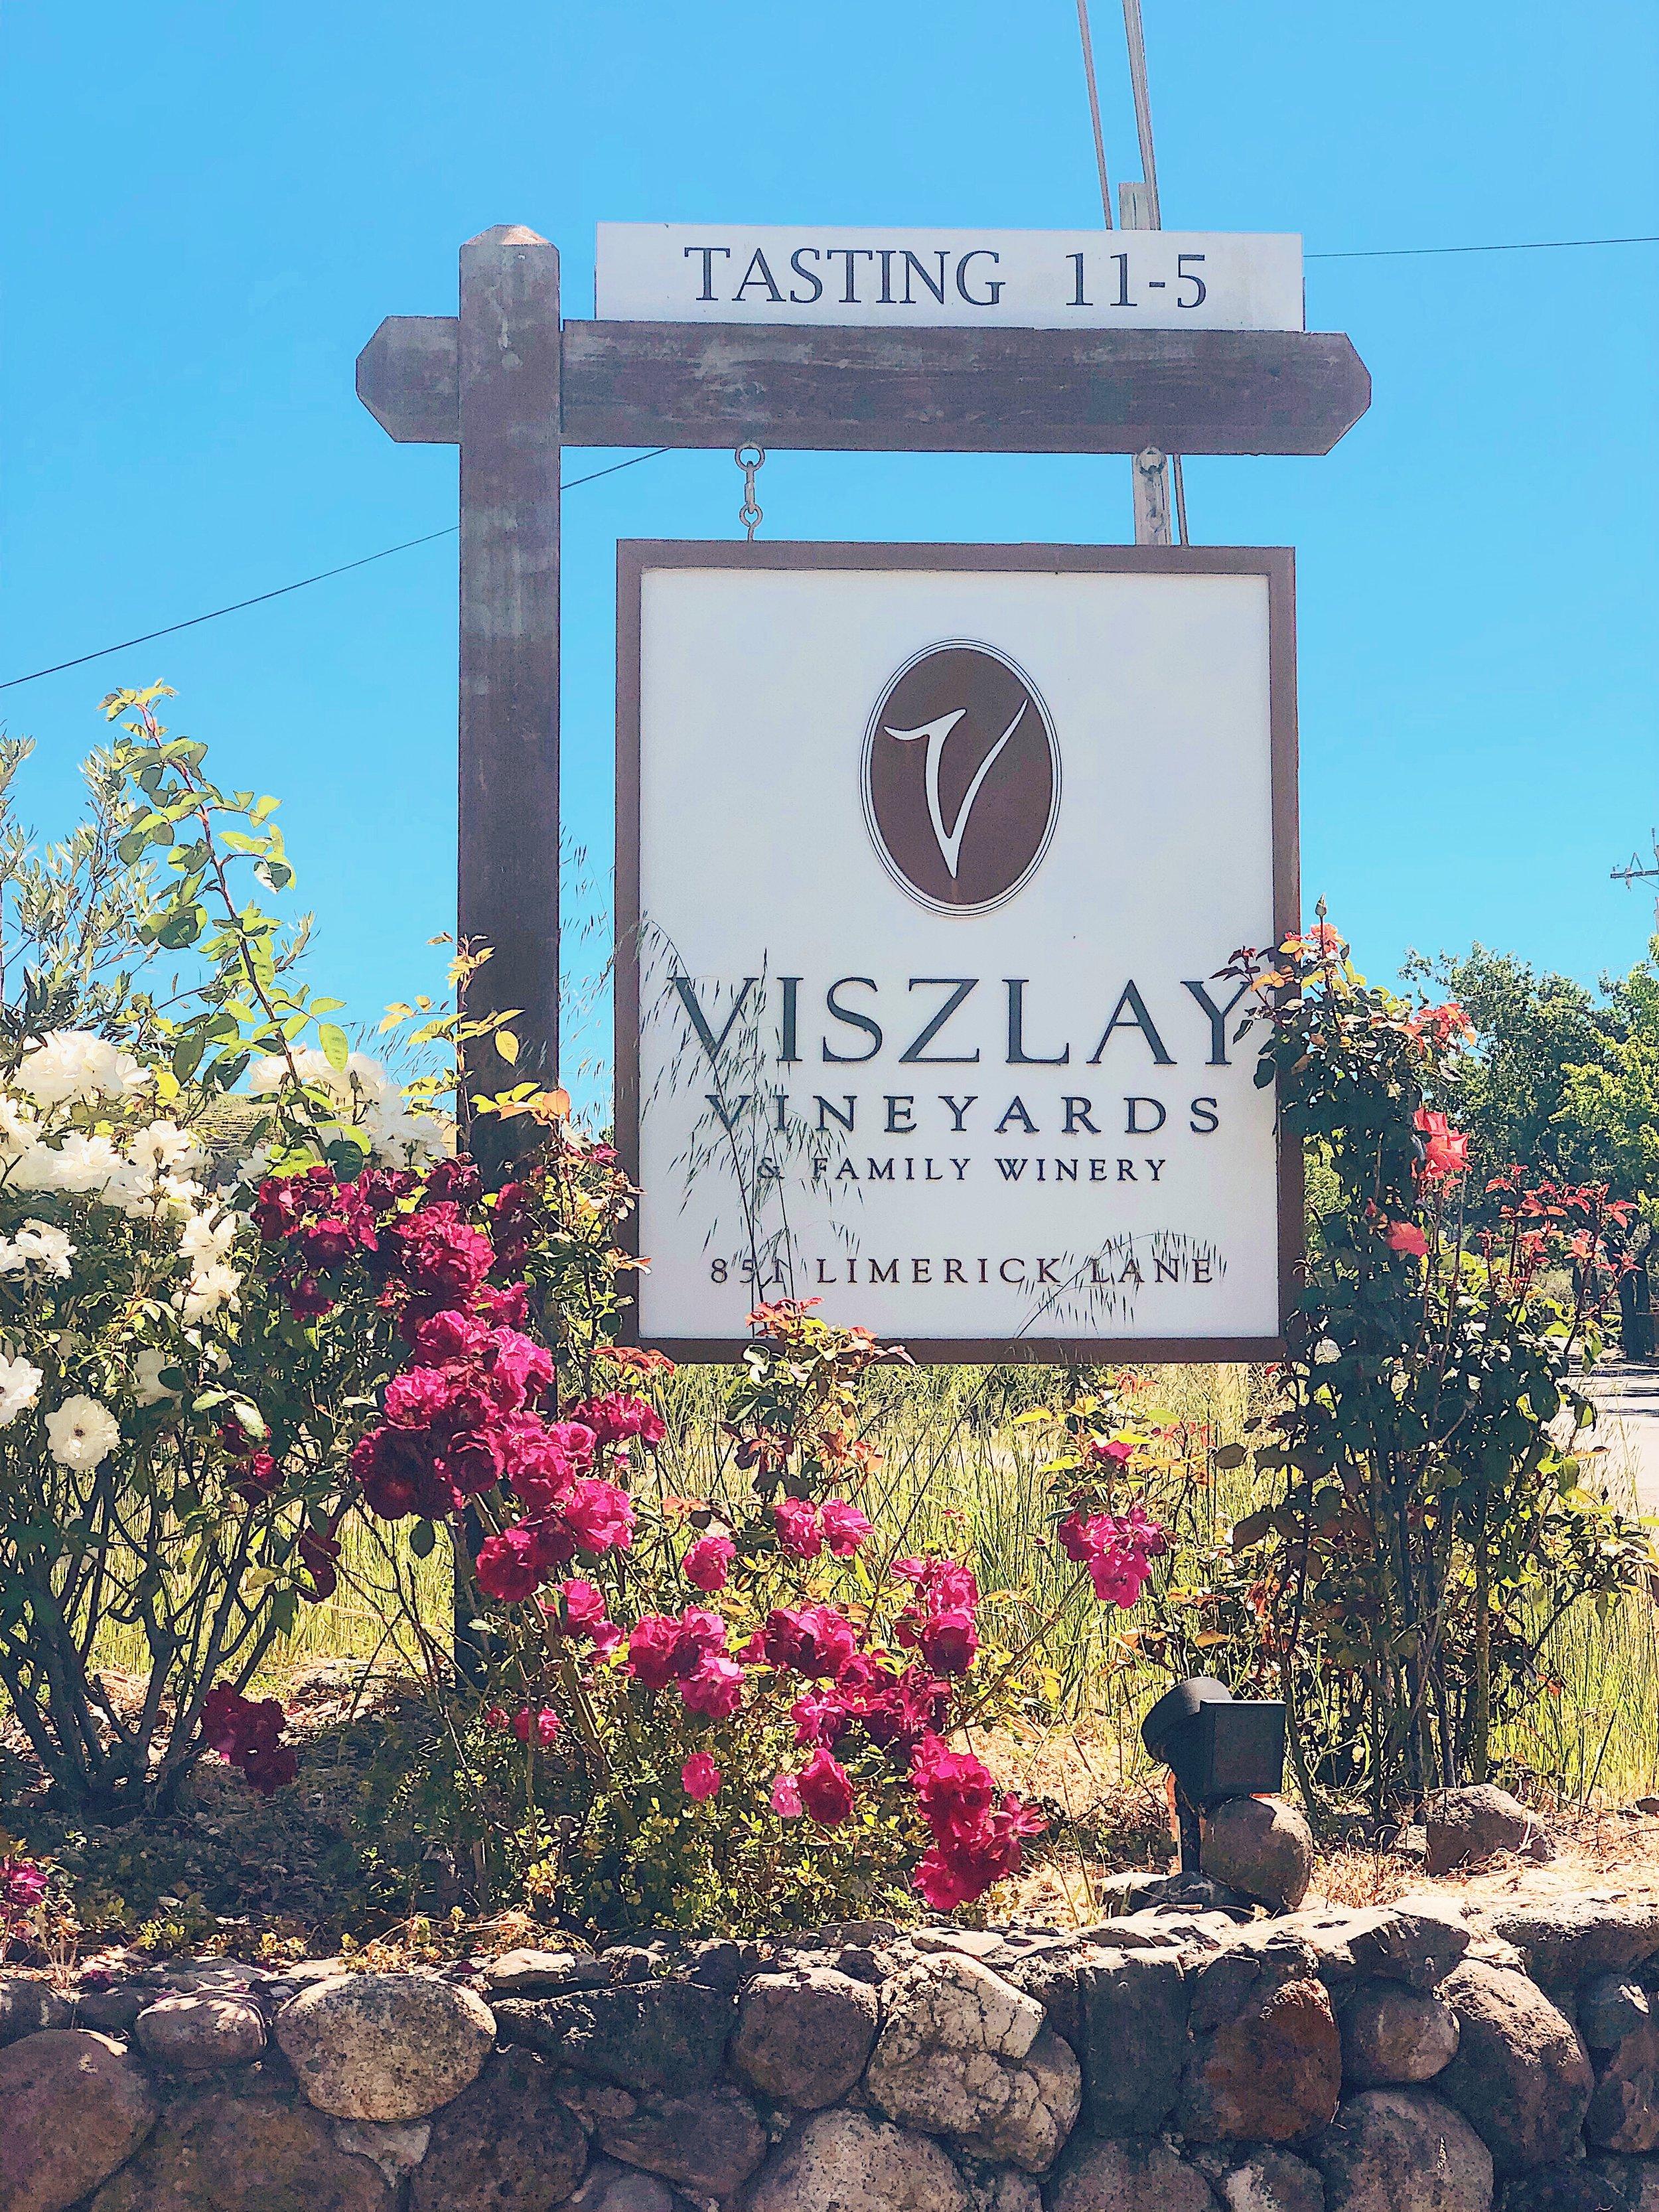 Viszlay Vineyards and Sonoma Wine Life